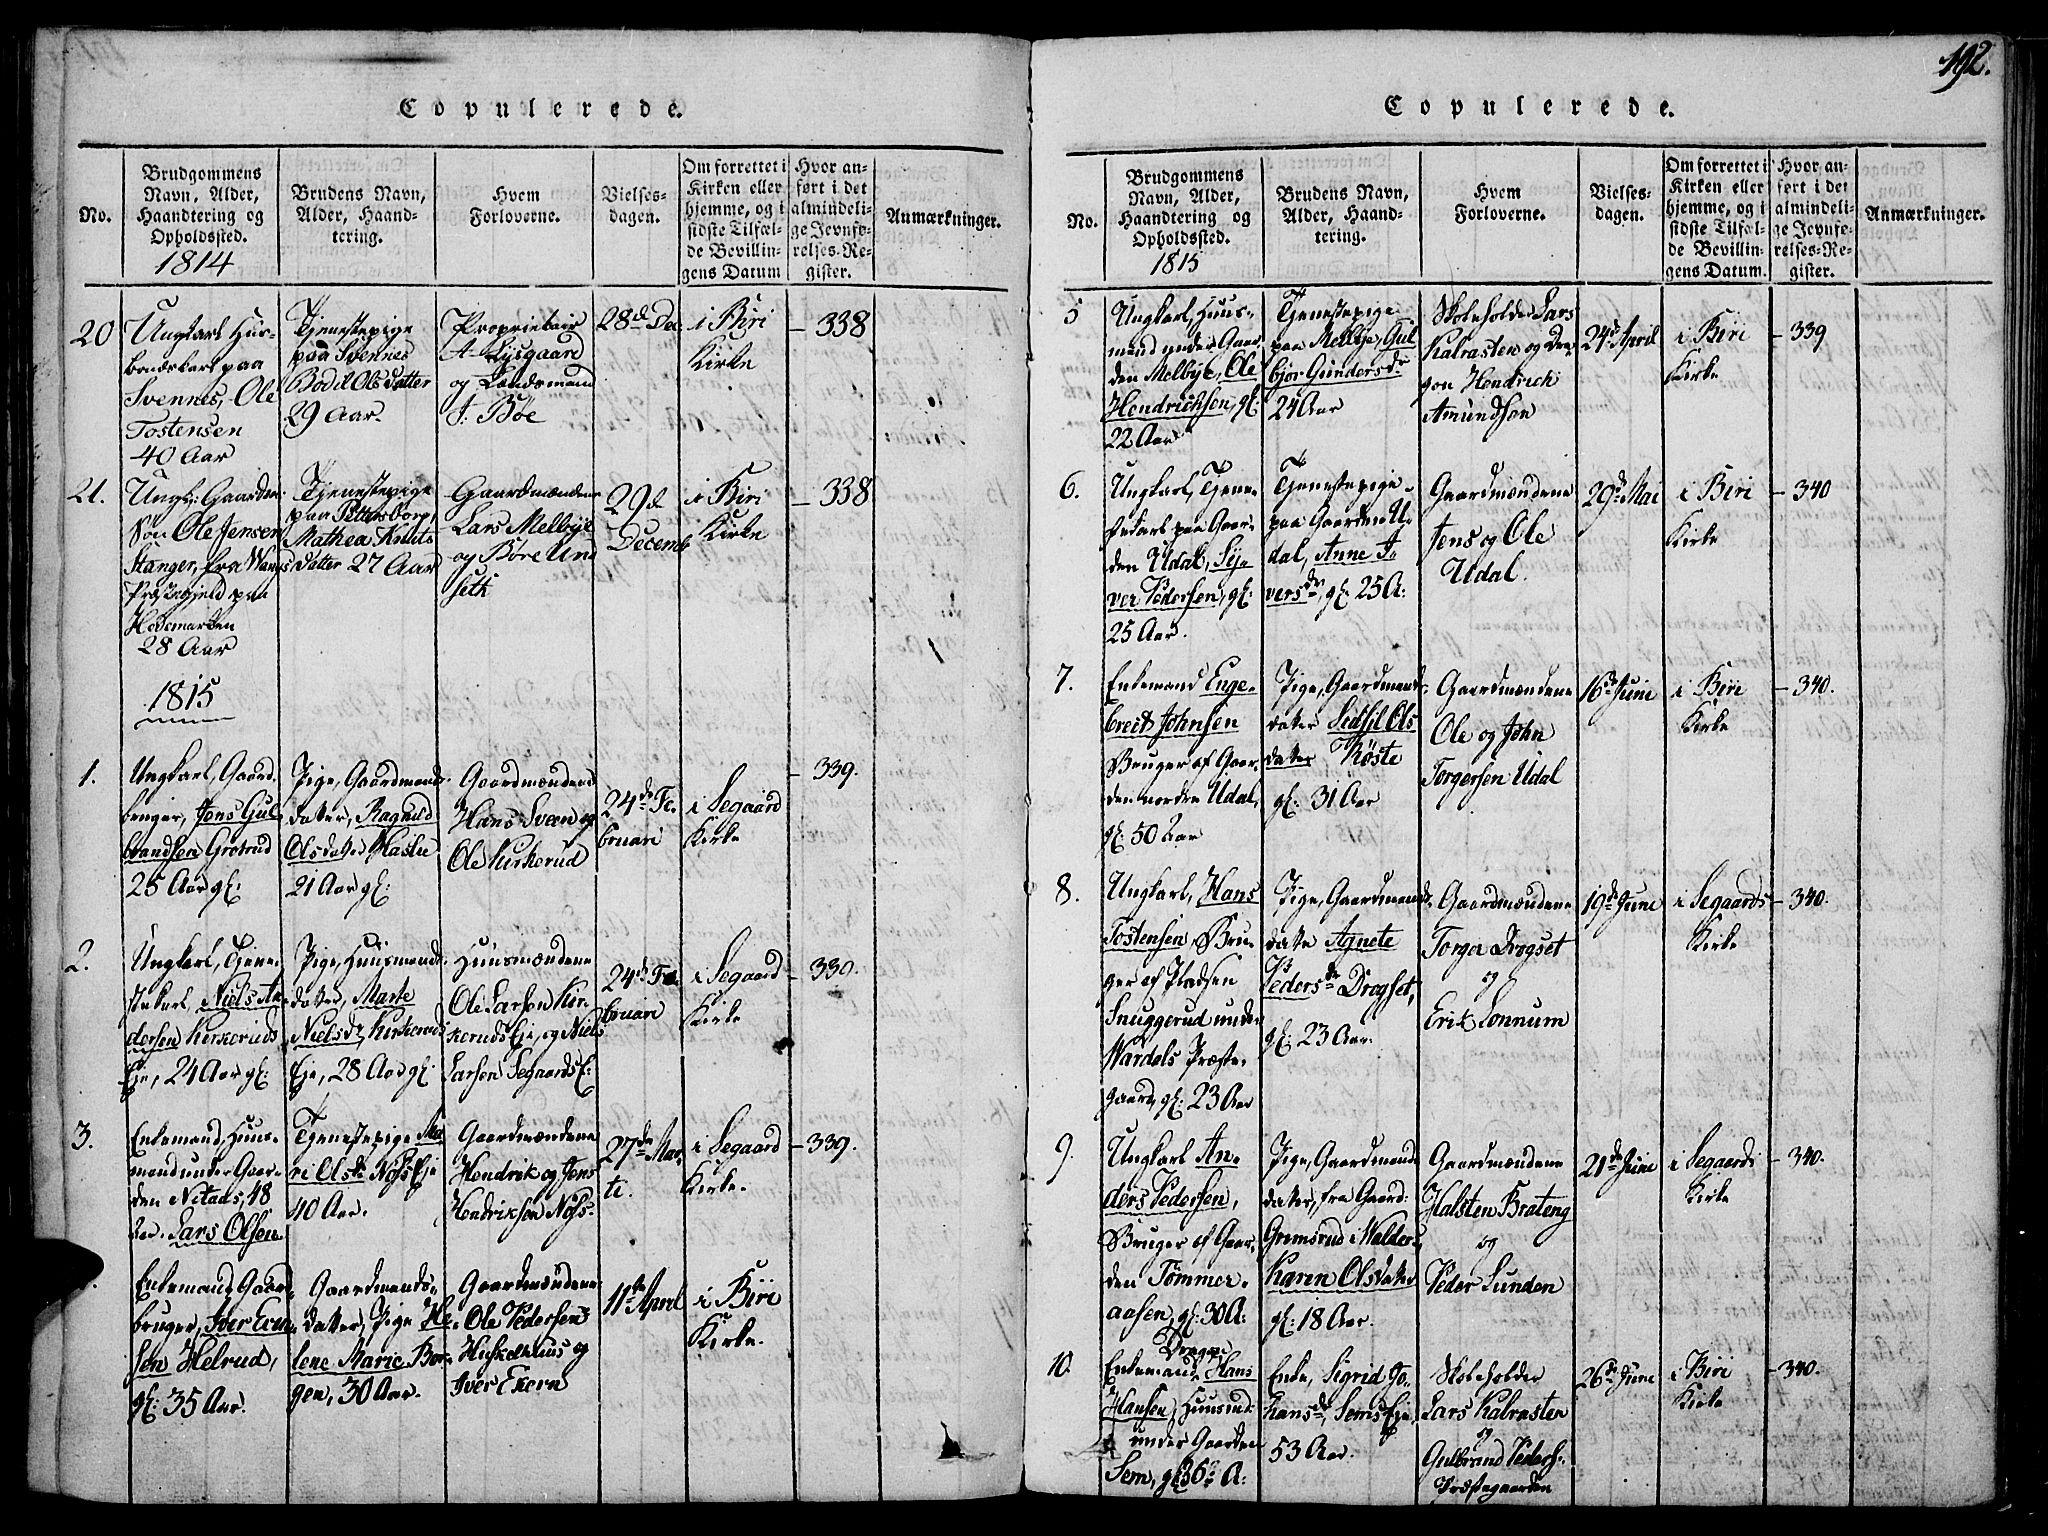 SAH, Biri prestekontor, Ministerialbok nr. 3, 1814-1828, s. 192